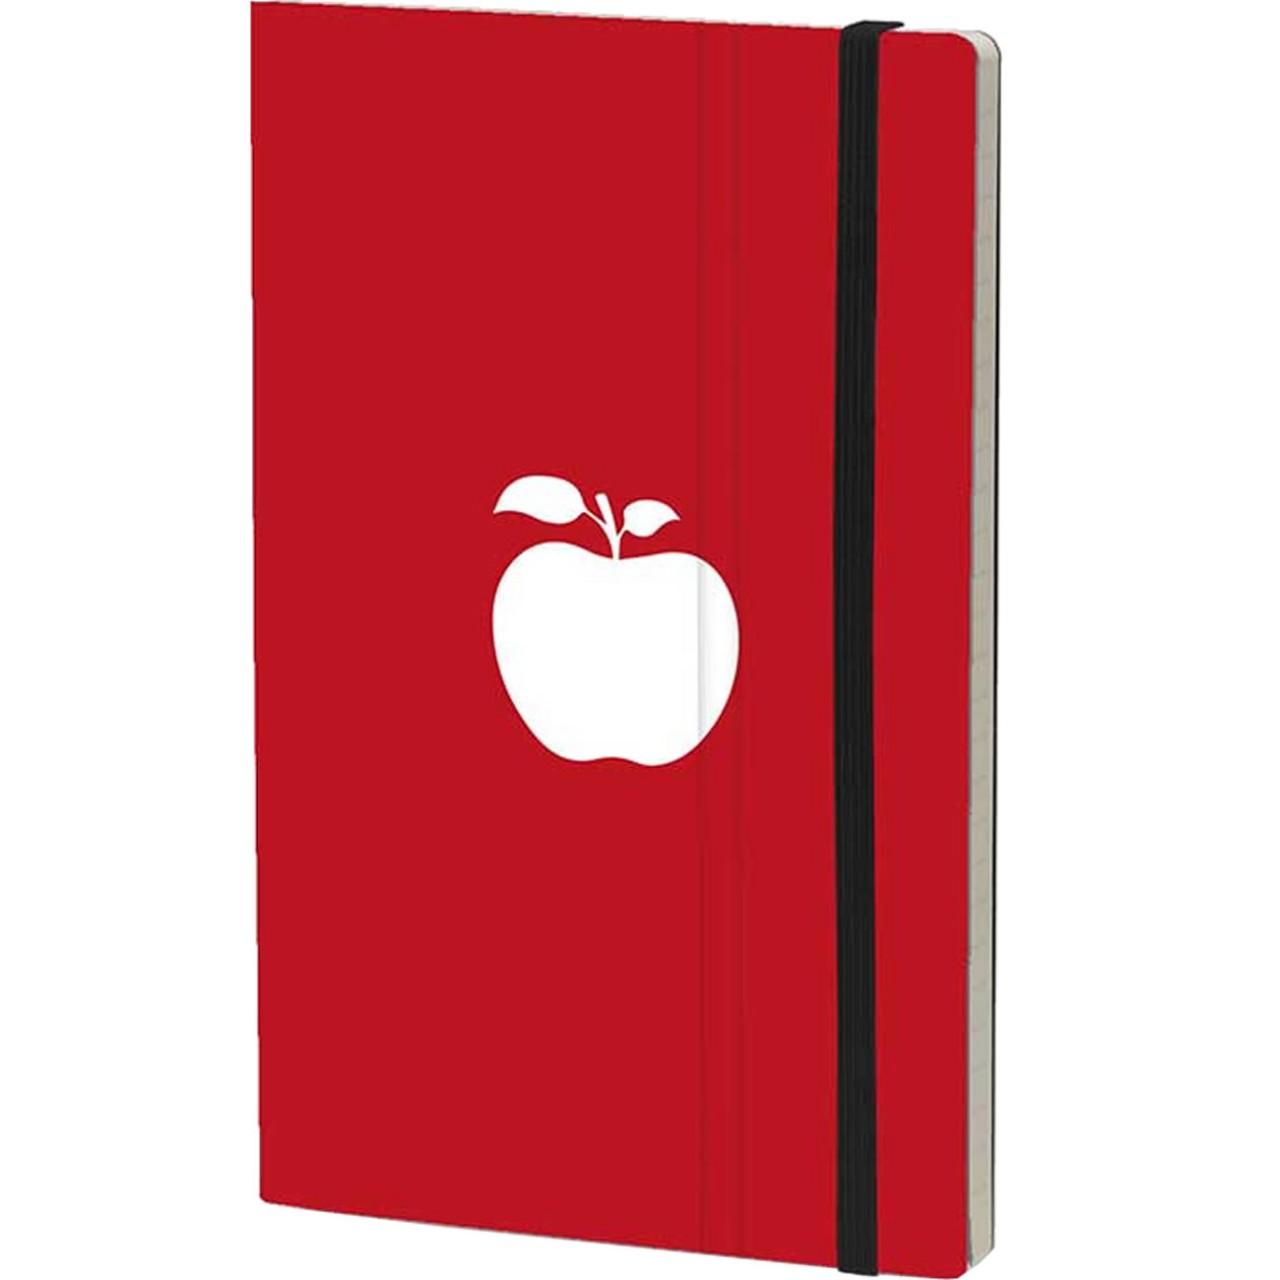 Stifflexible Notizbuch FRESH FRUIT 13 x 21 cm 192 S., APPLE